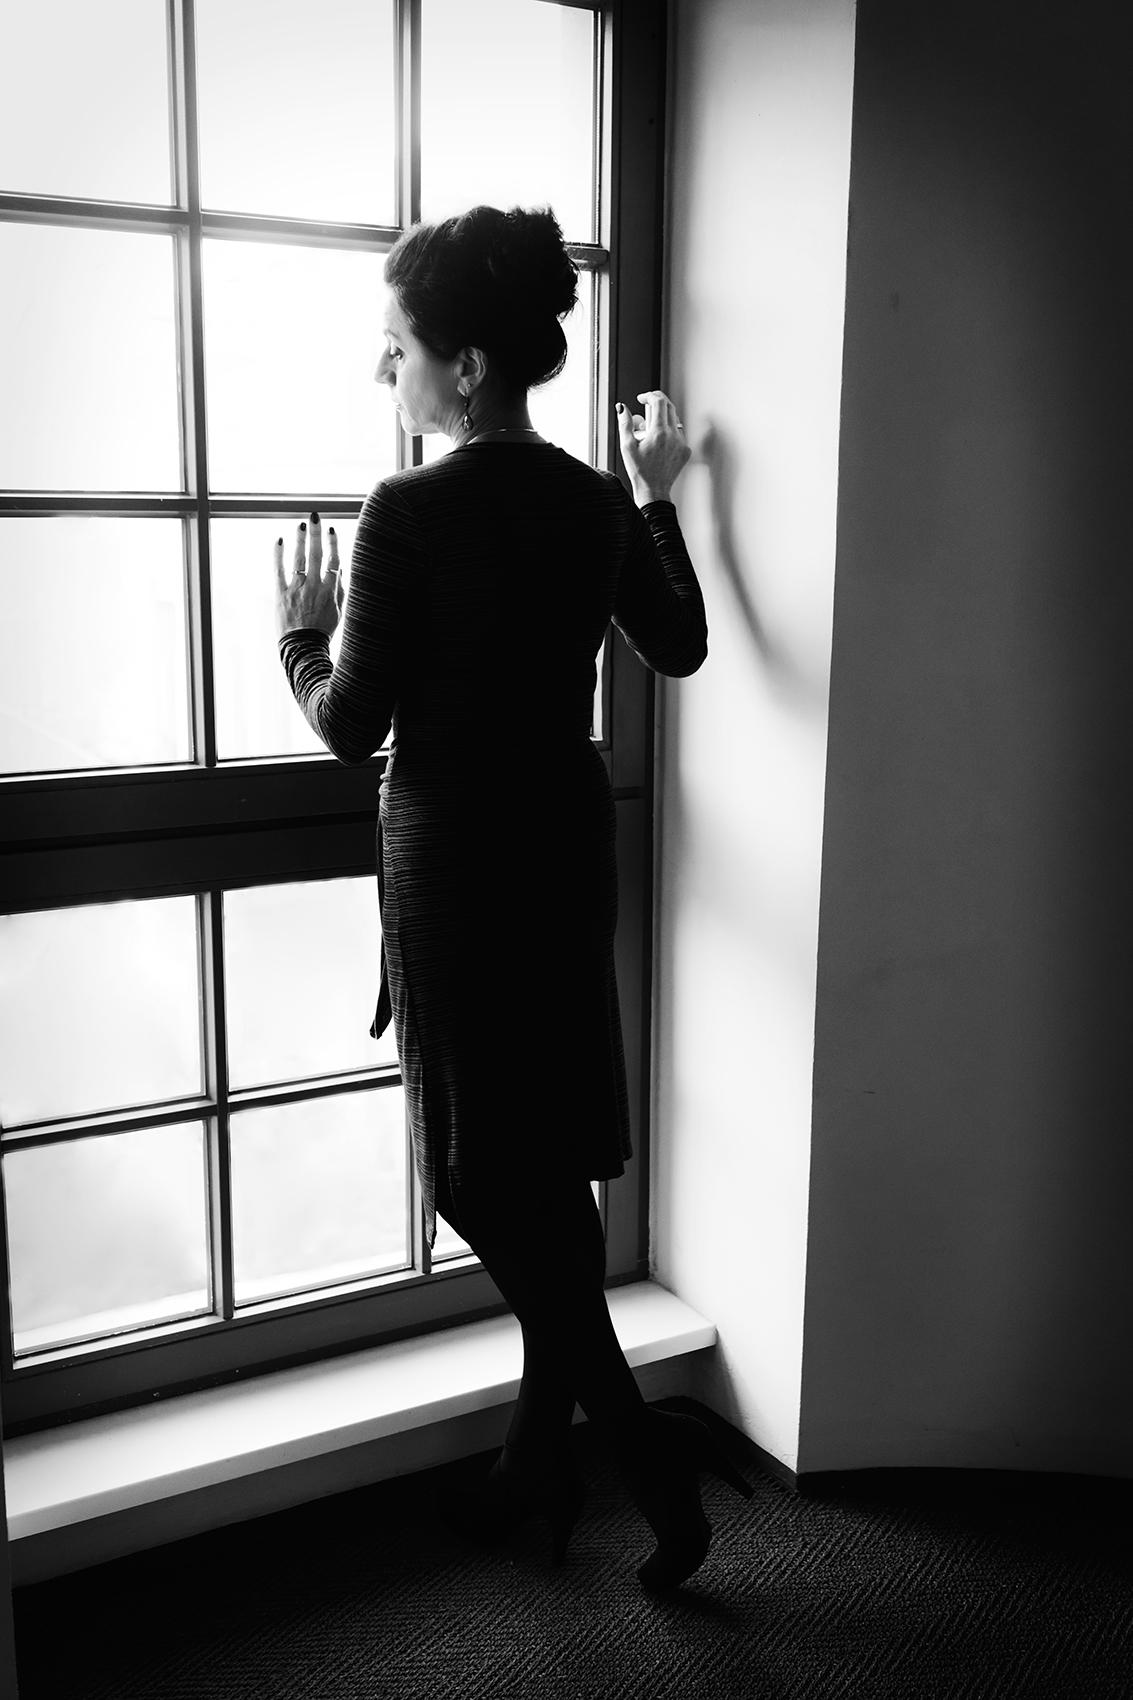 Linda Scholz Fotografie elegante Frauenfotografie Potsdam Berlin.jpg